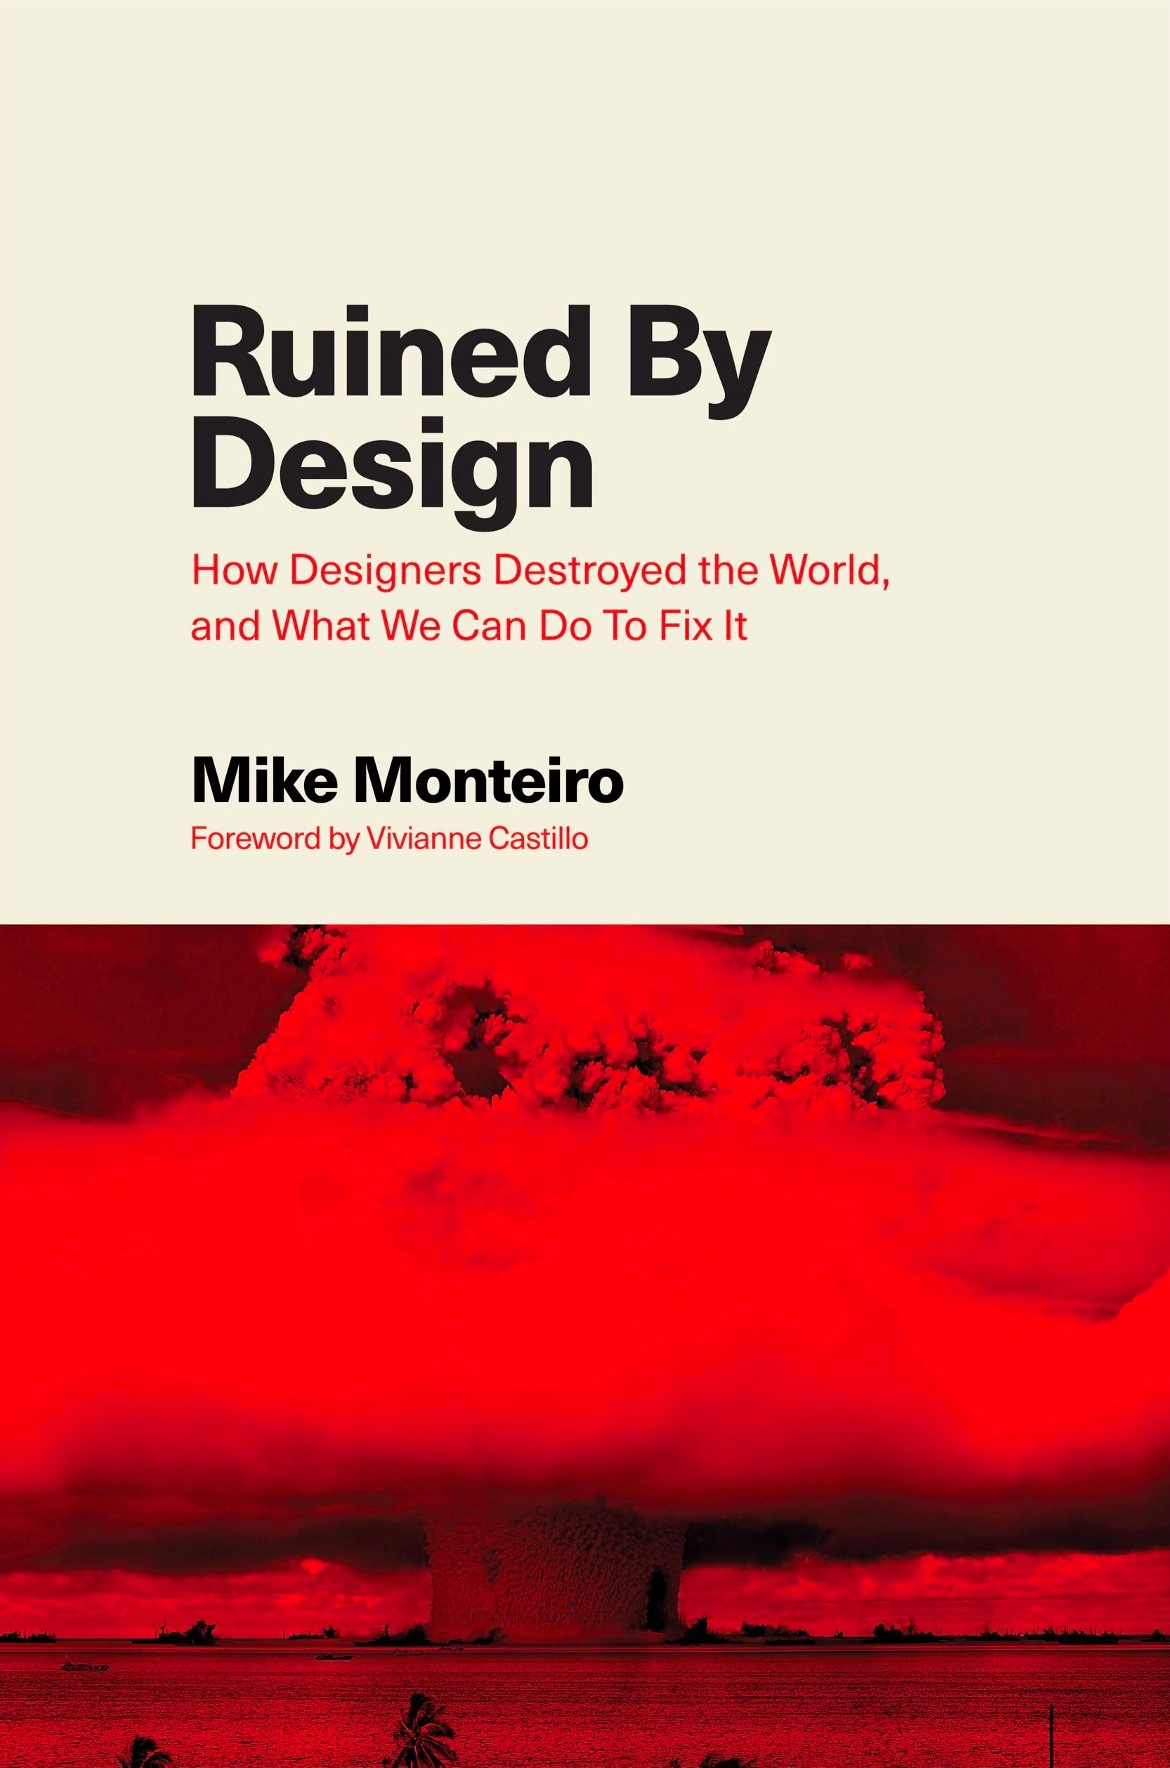 RuinedByDesign_MikeMonteiro.jpg